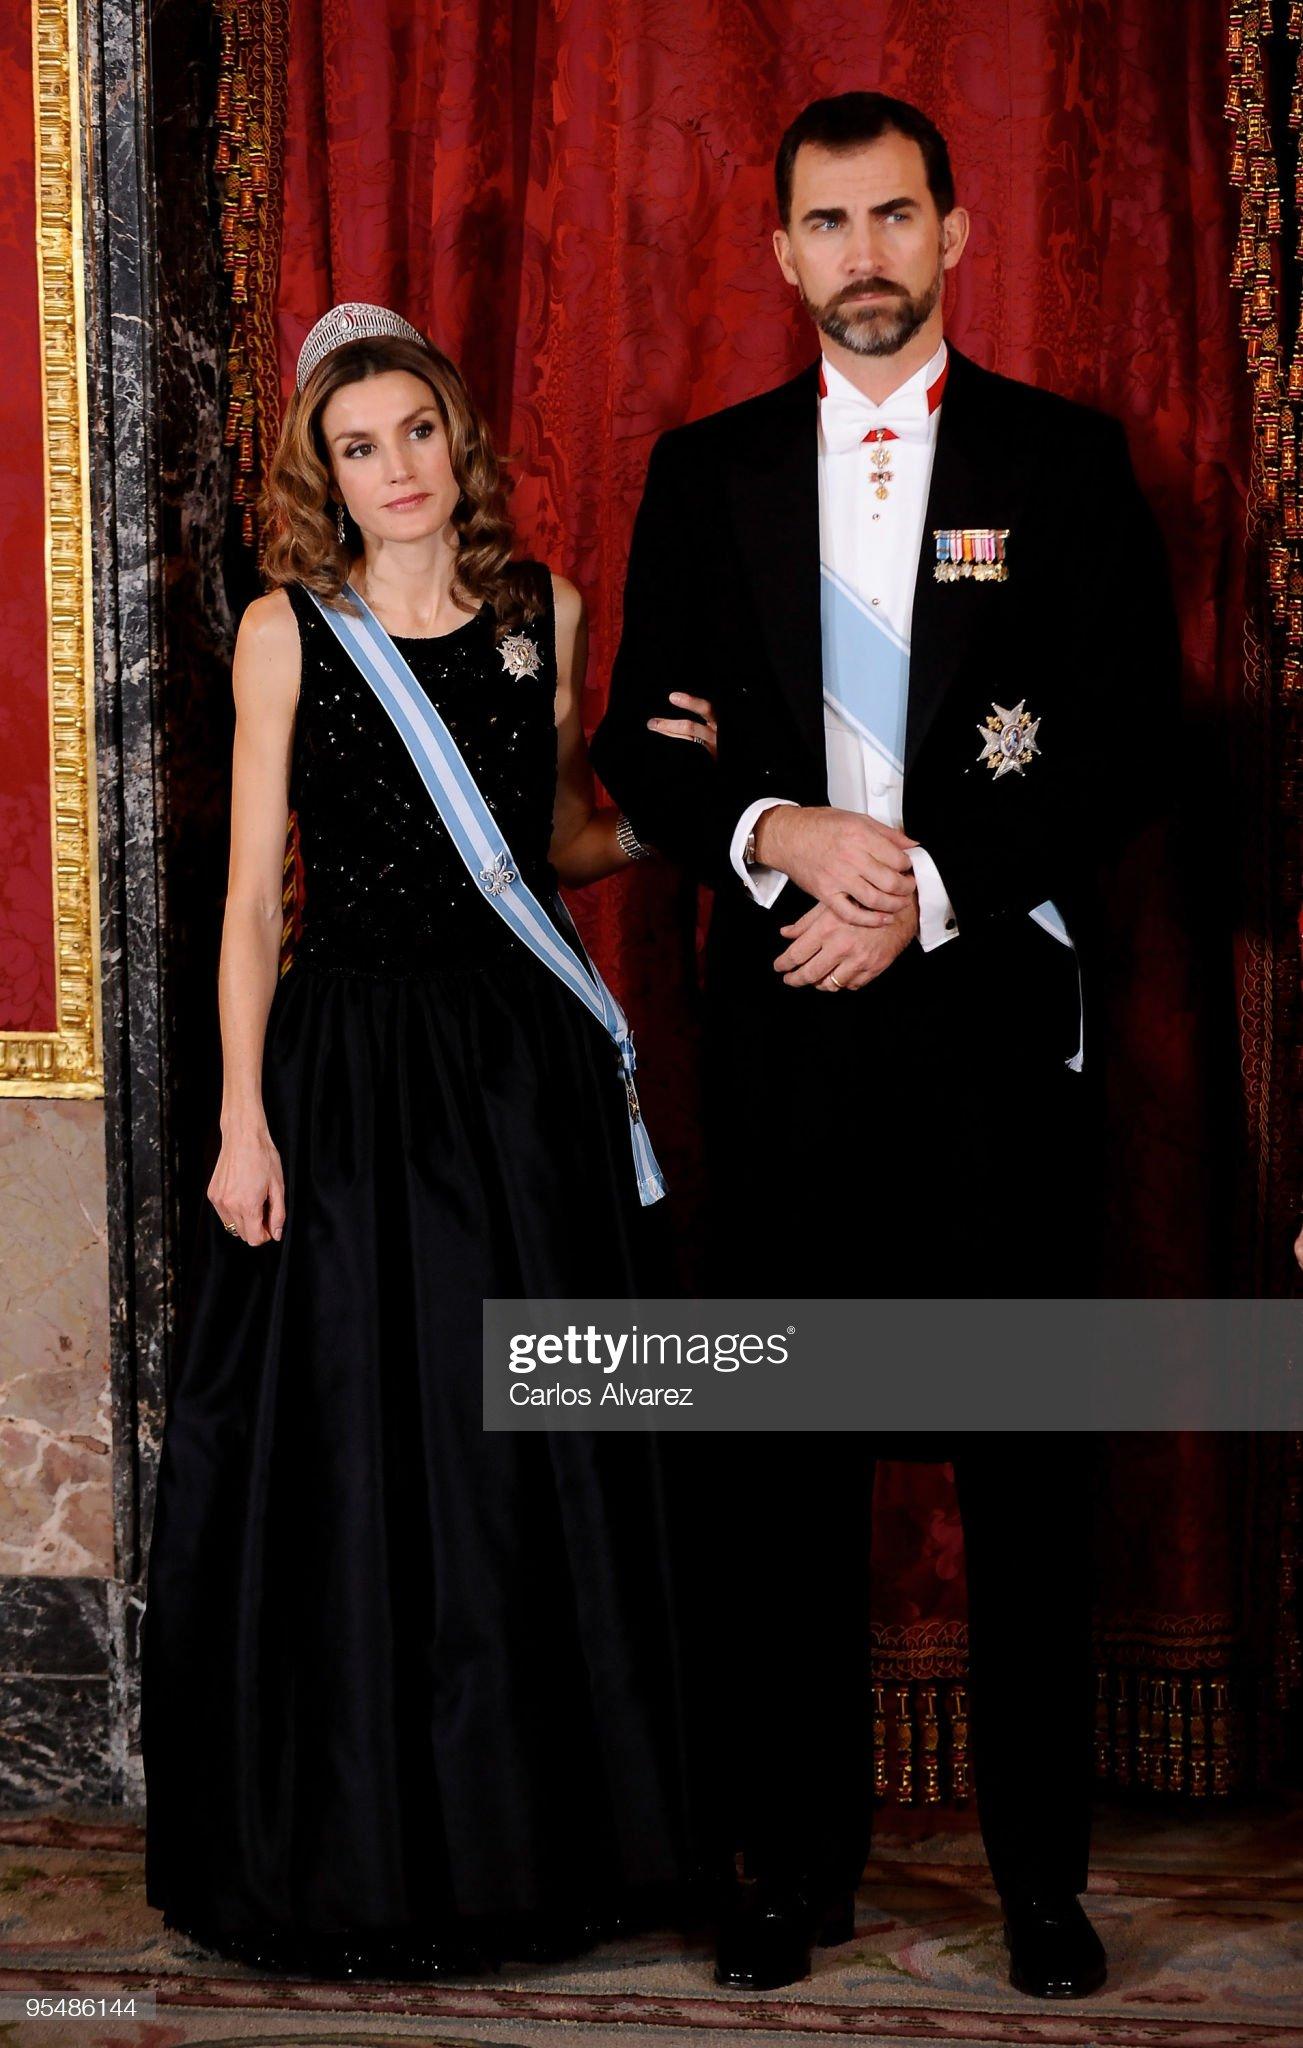 Вечерние наряды Королевы Летиции Spanish Royals Host Gala Dinner In Honour Of The President Of Vietnam : News Photo